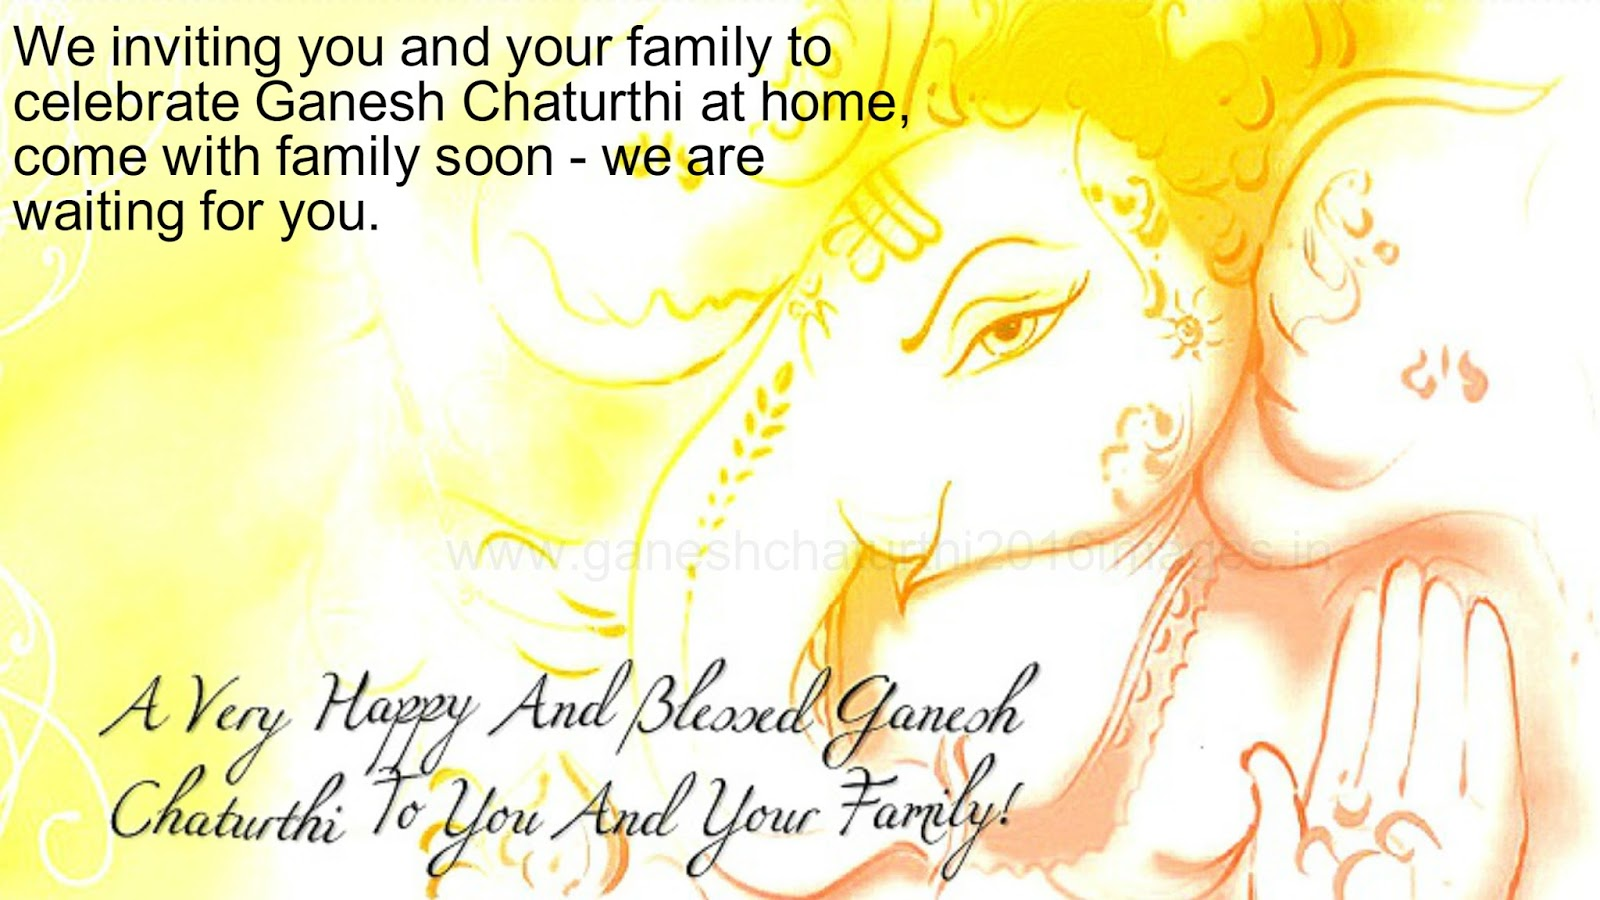 Ganesh pooja invitation message in marathi invitationjpg ganpati invitation sms cards text messages wishes in marathi hindi stopboris Image collections